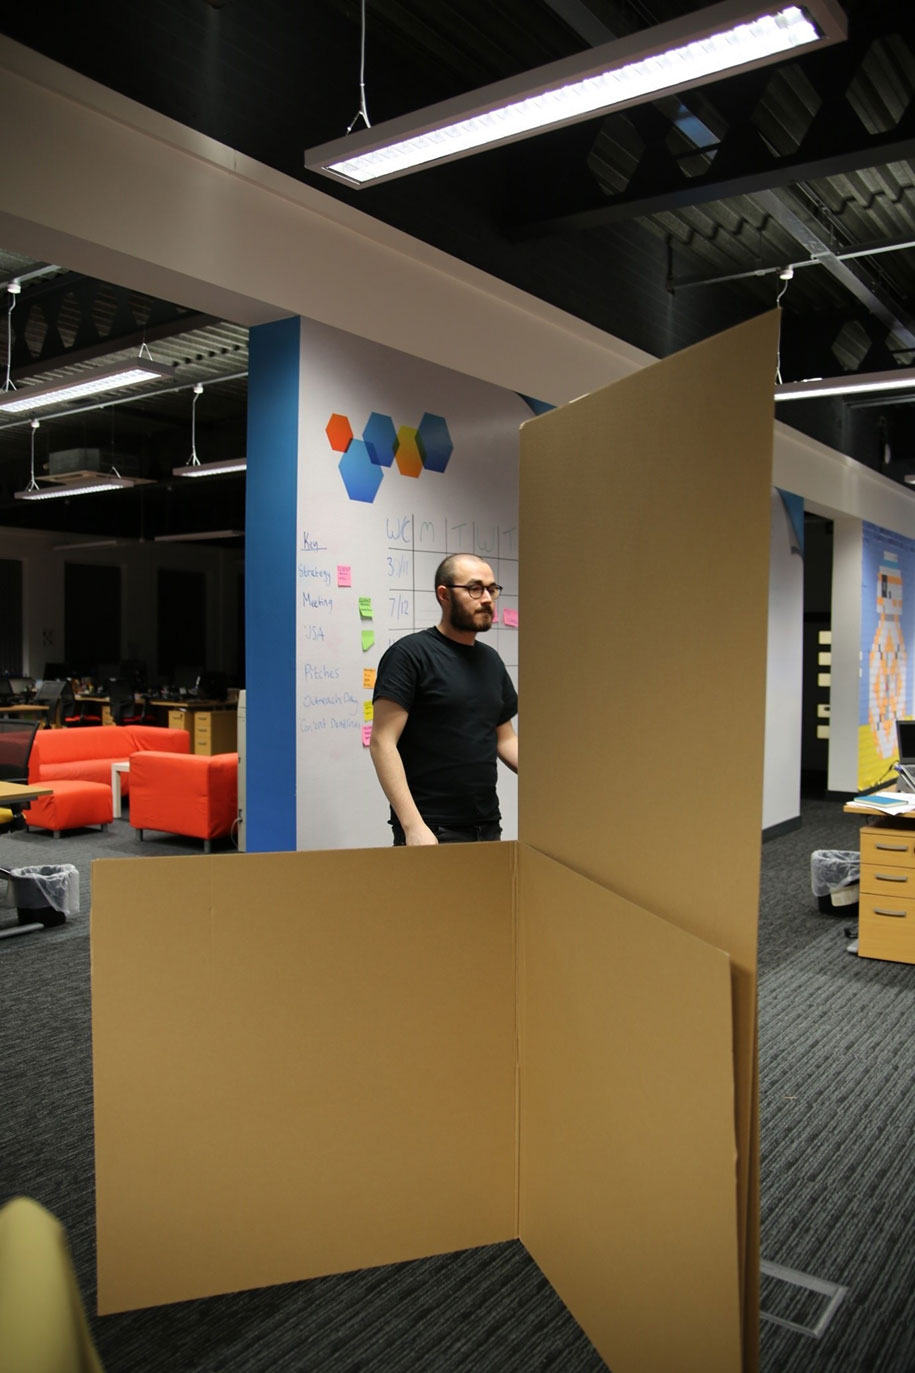 office-team-cardboard-castle-karl-young-viking-6